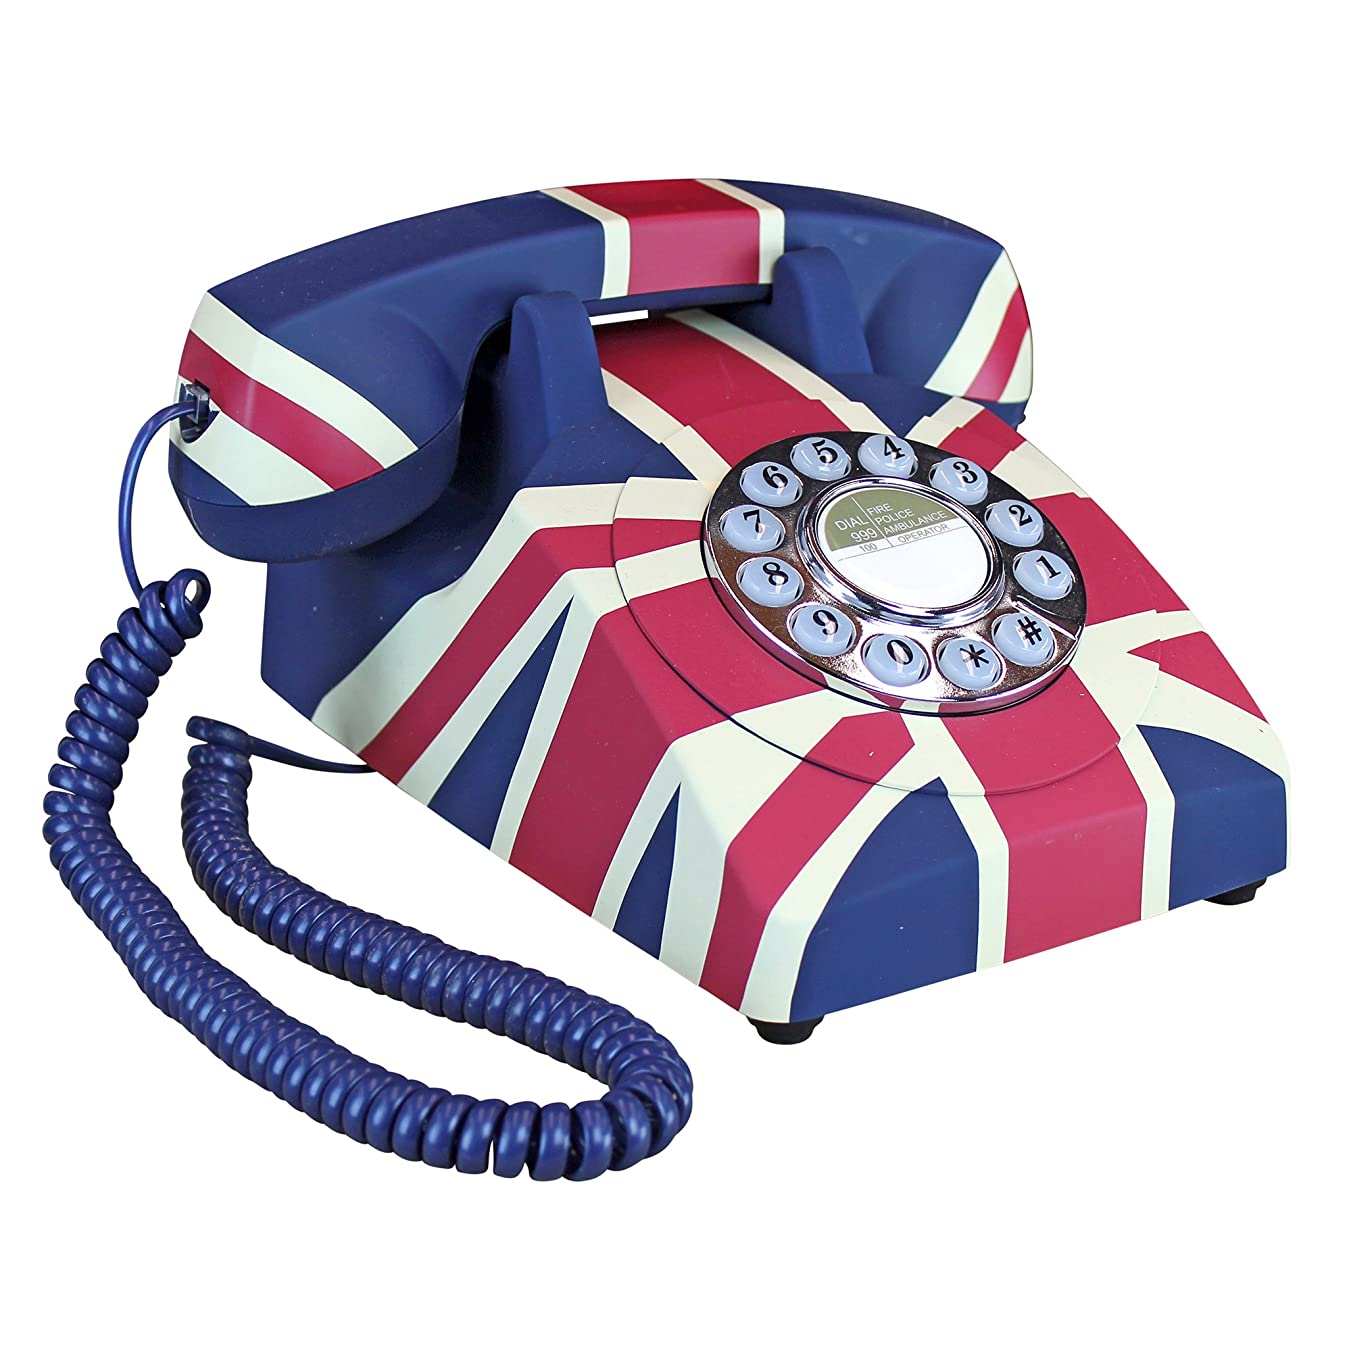 Design Toscano British Flag Antique Union Jack Rotary Corded Retro Phone - Vintage Decorative Telephones, one Size, Full Color